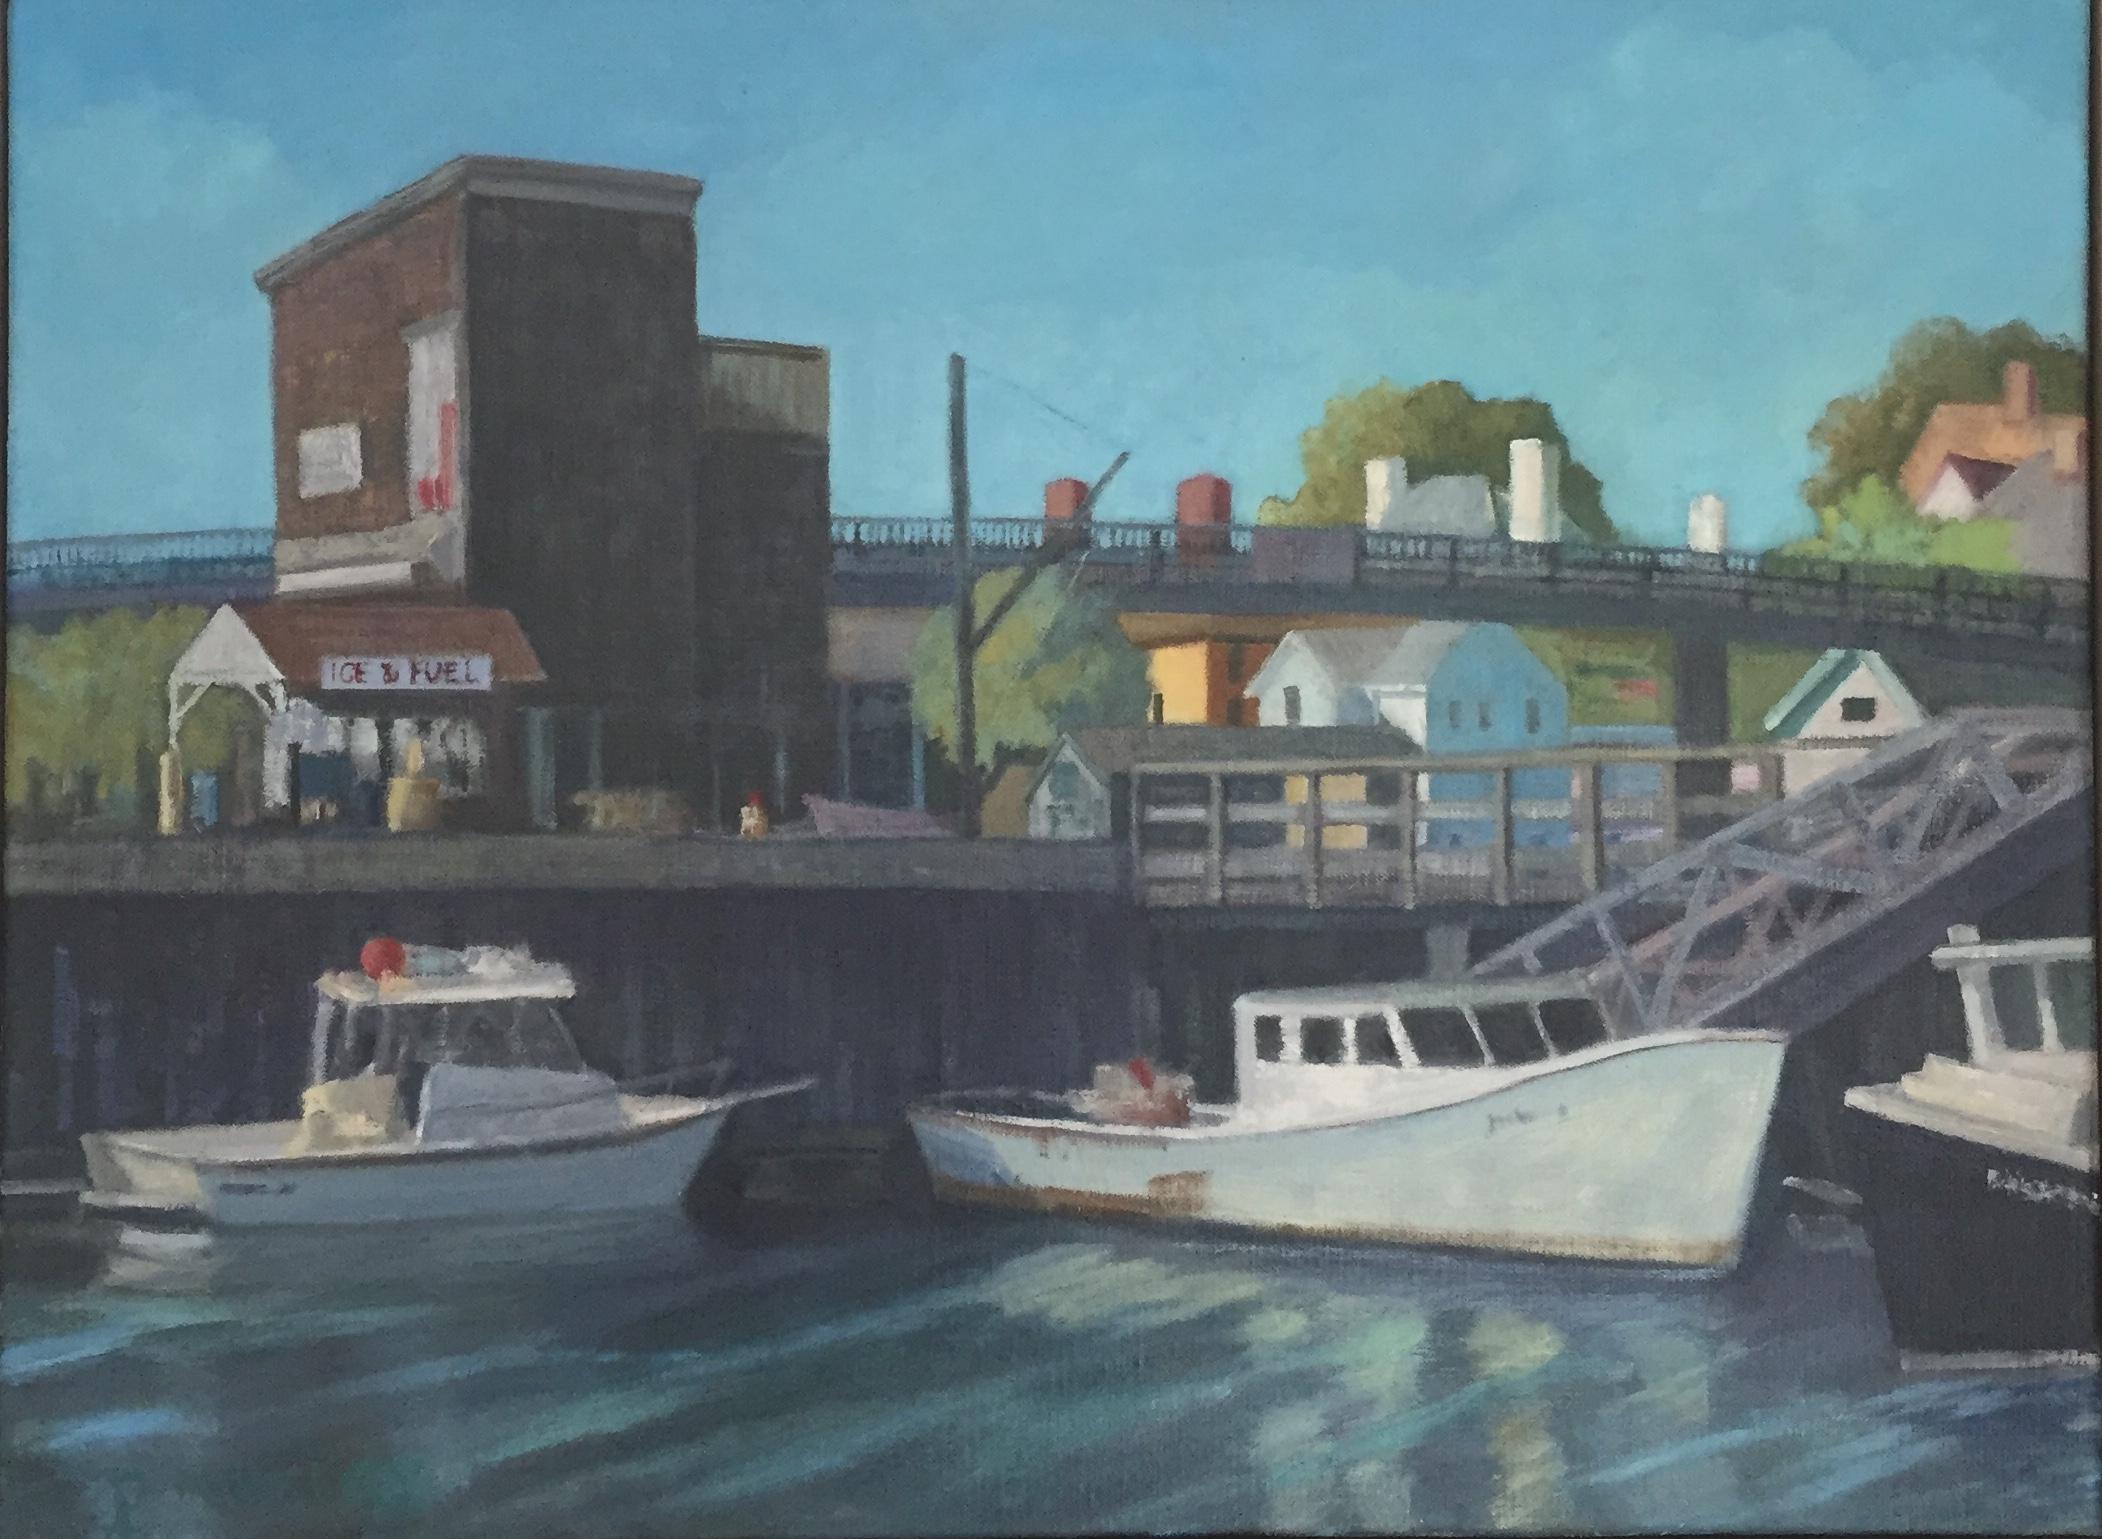 Peirce Island Wharf, View 2